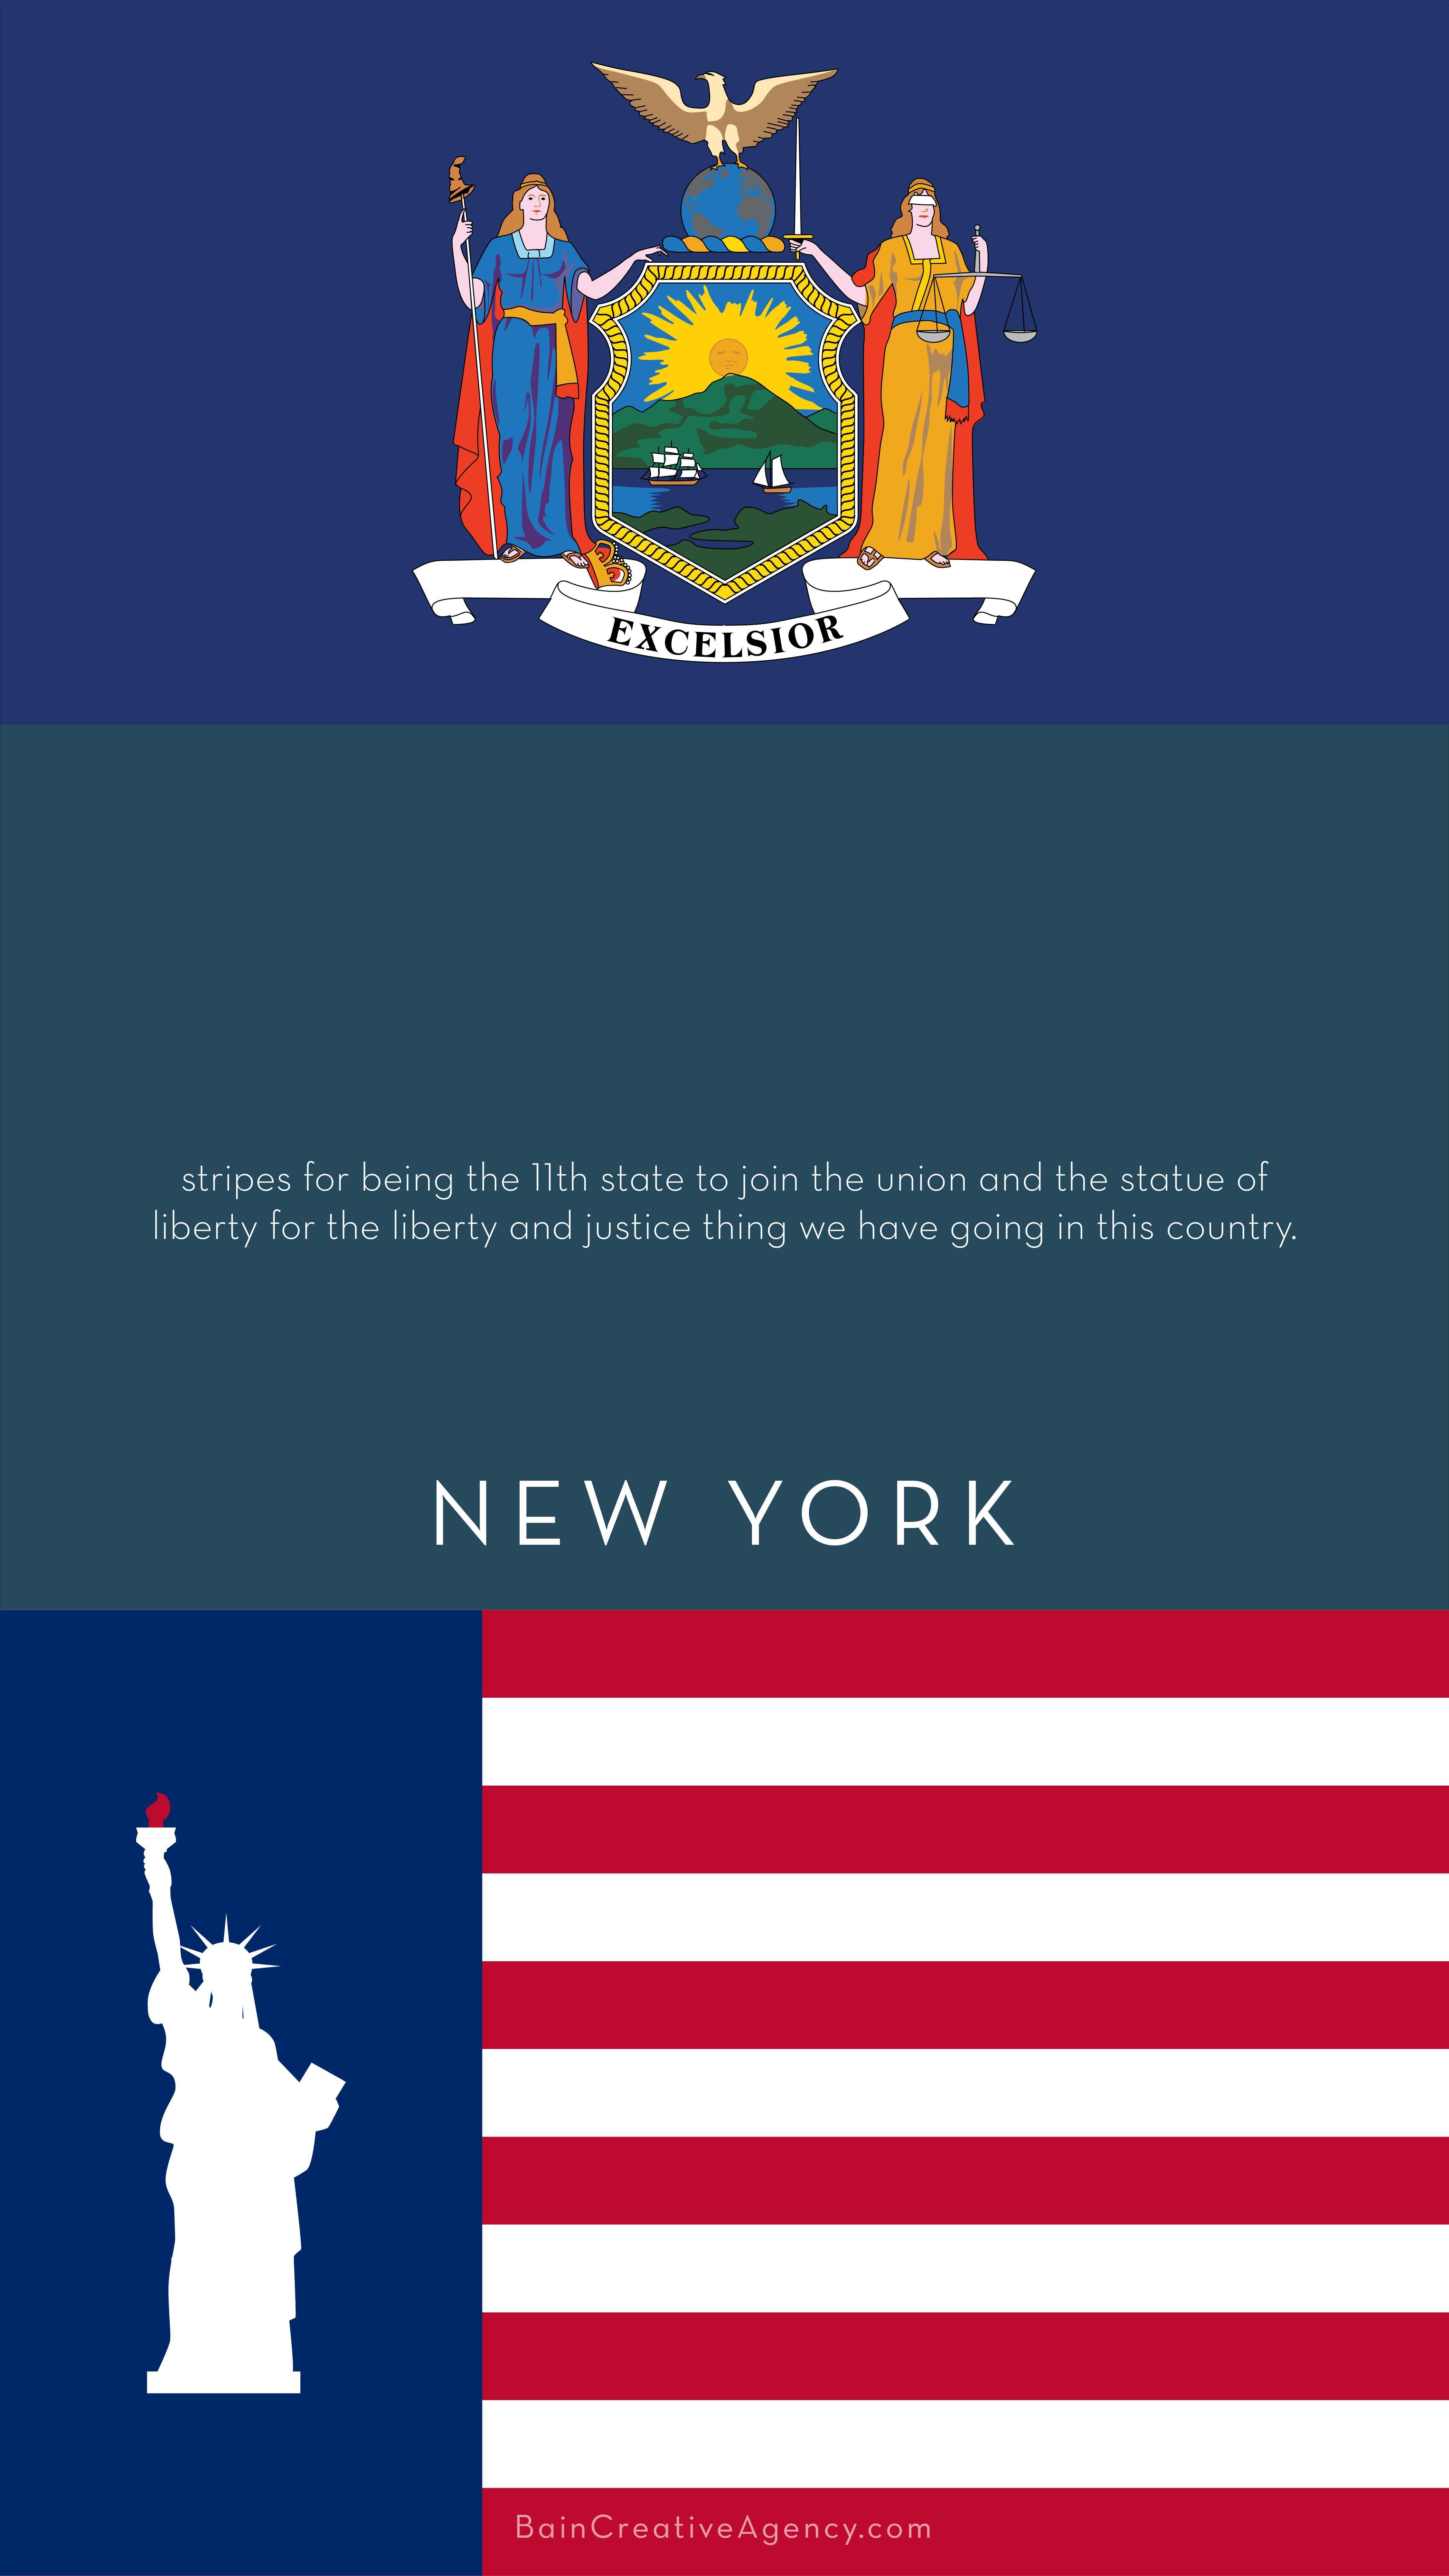 220023ae41d17614236c0e58b27fb925 - New York State Star Application